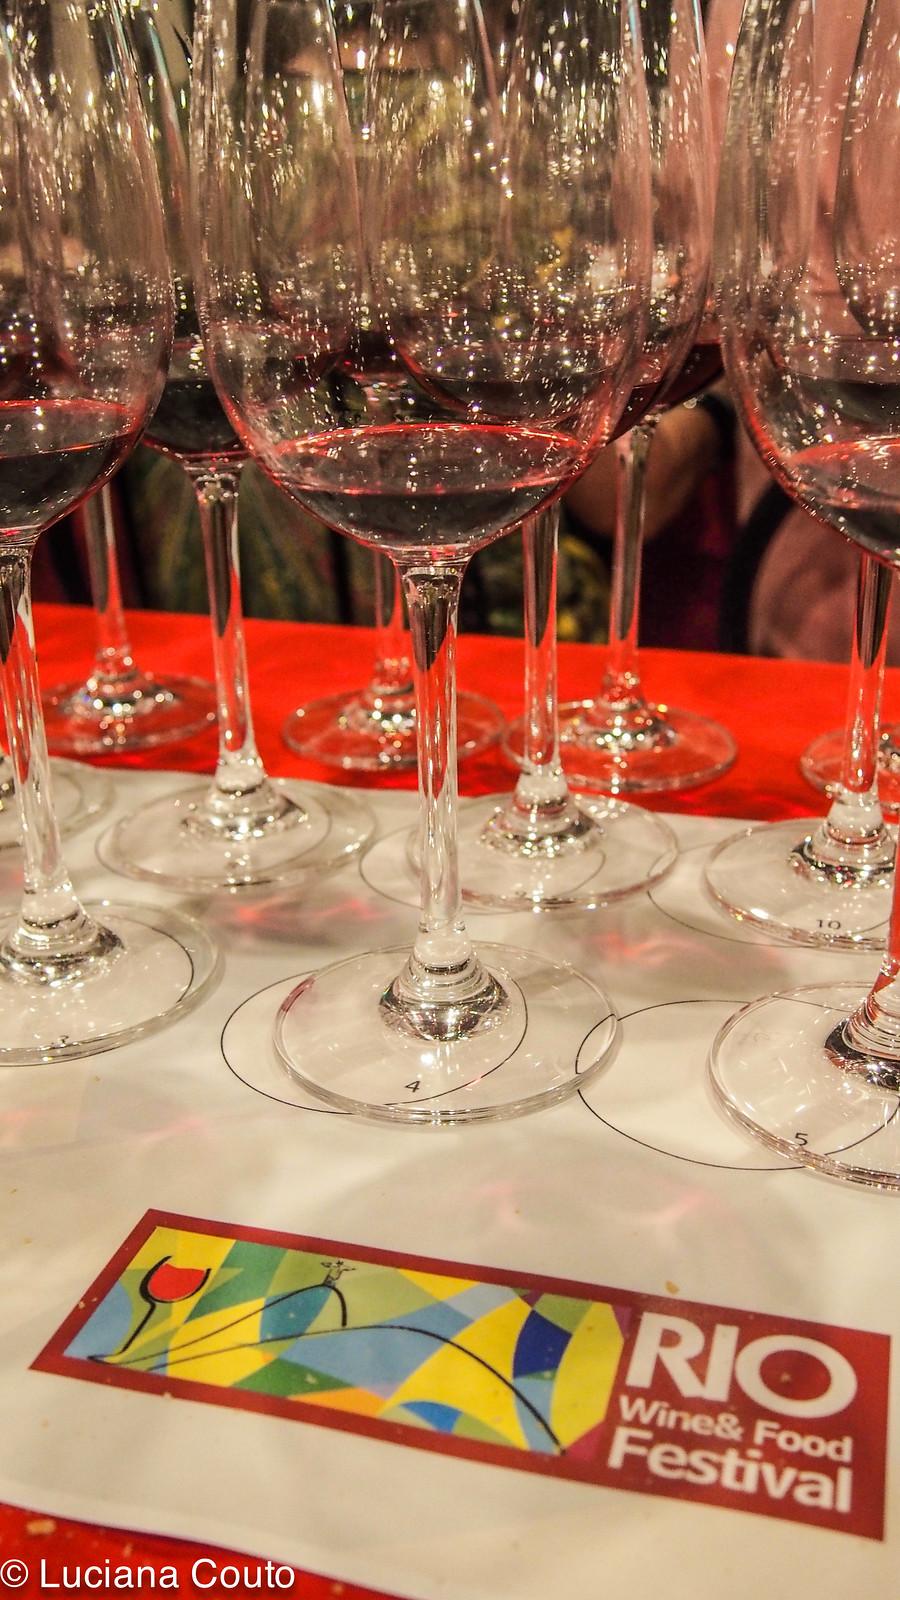 Rio Wine & Food Fetsival 2015